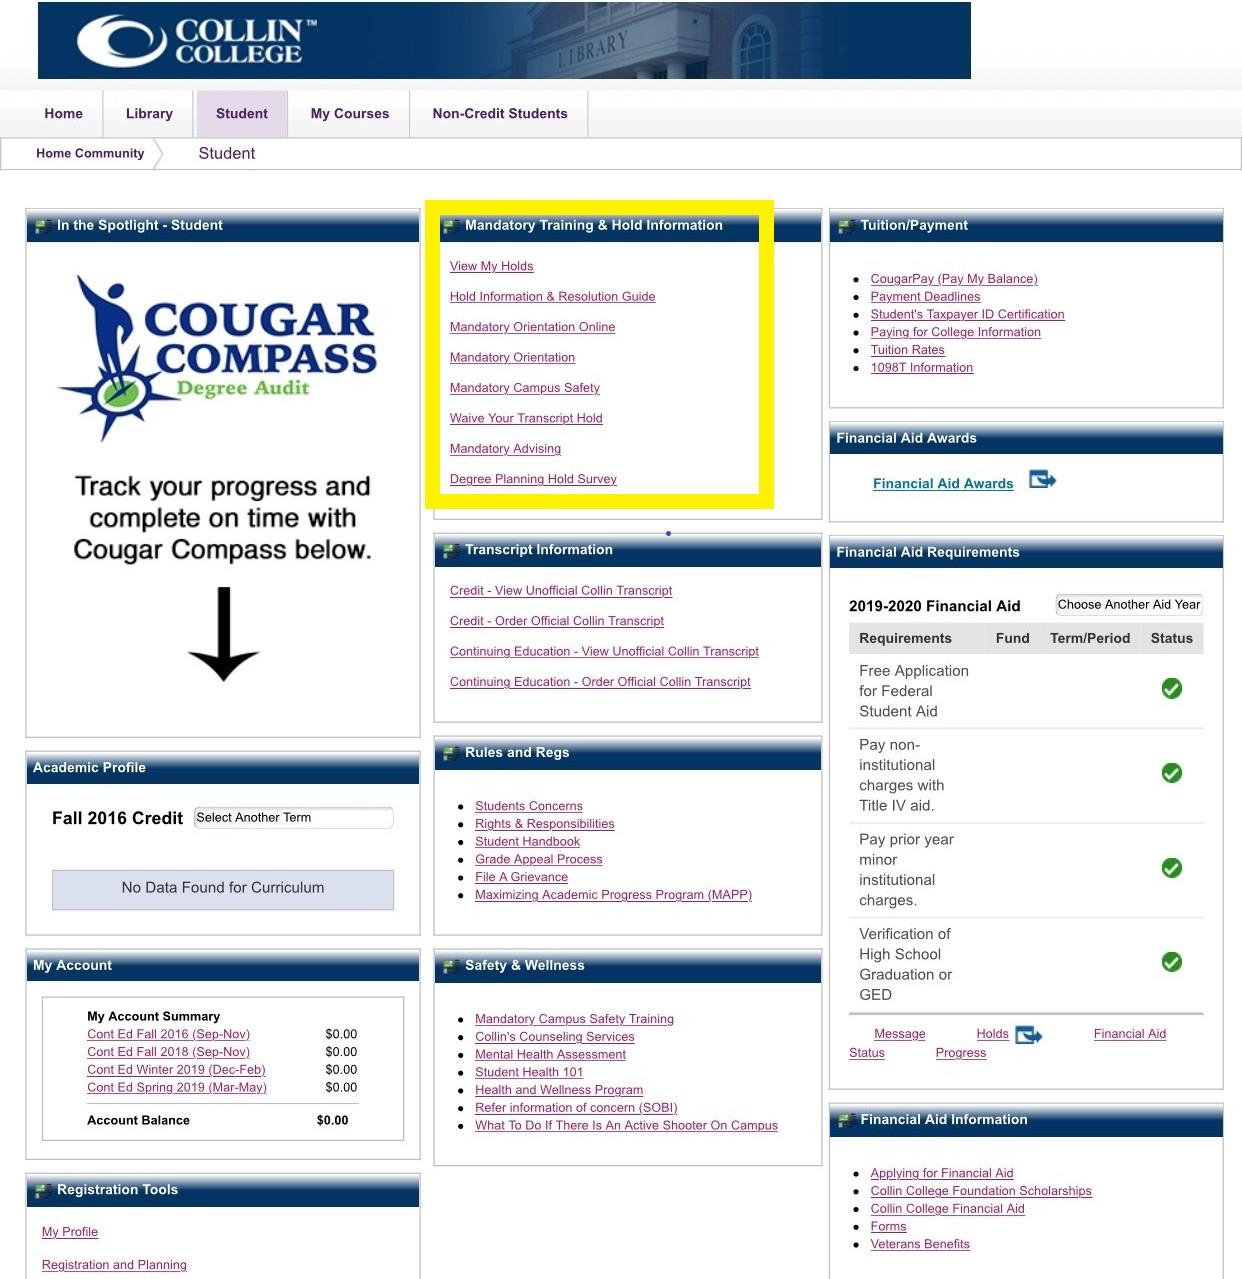 New Student Orientation Registration - Collin College In Collin County Community College District Calendar